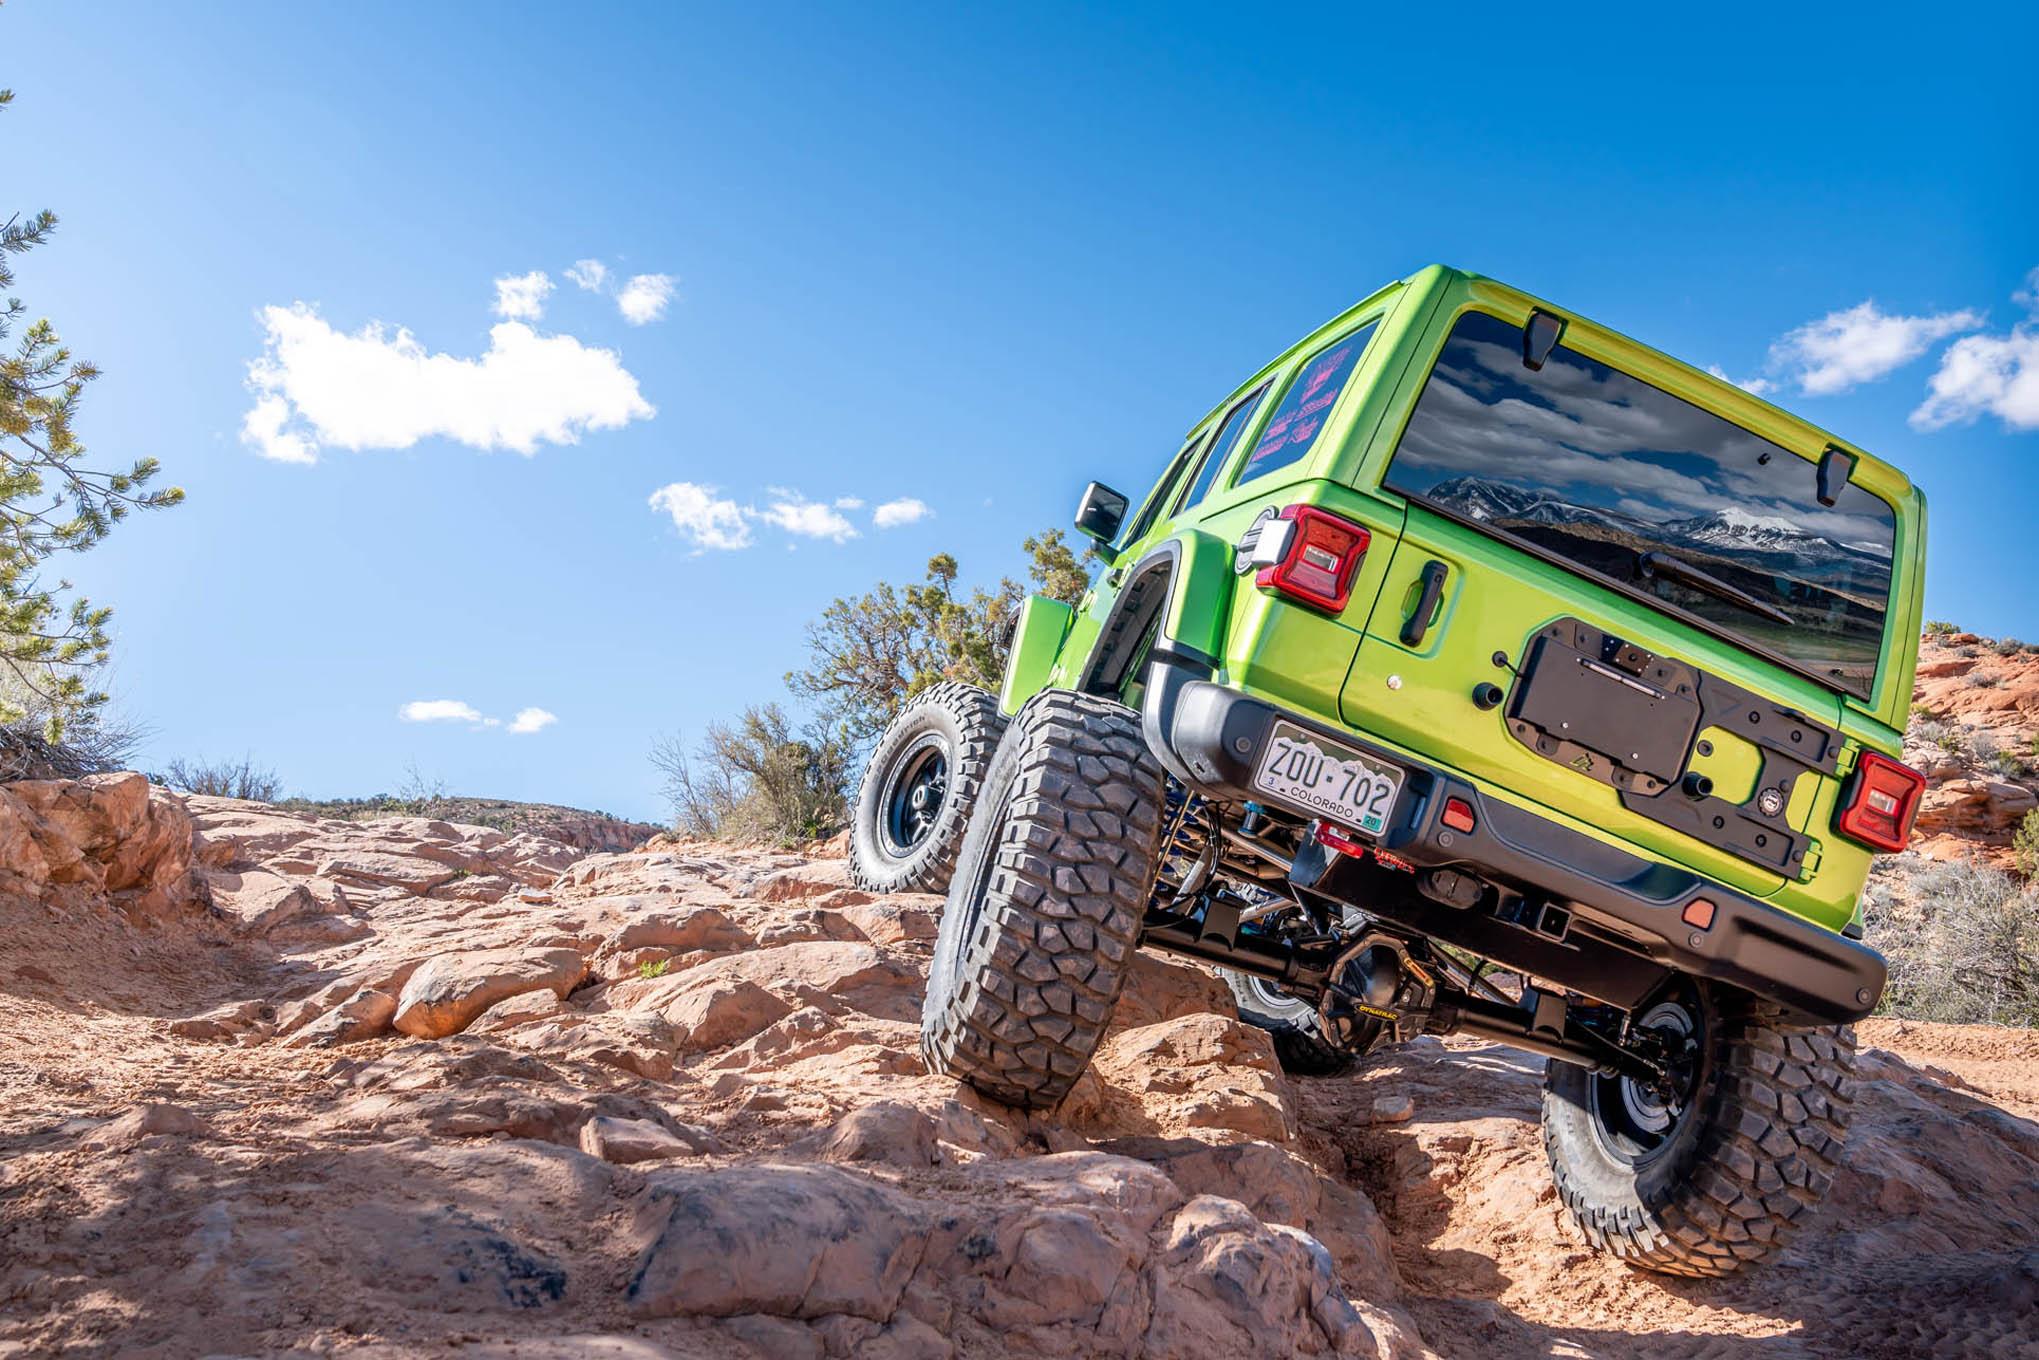 0018 2018 jeep wrangler unlimited rubicon dynatrac prorock 42 dixie 4 wheel drive